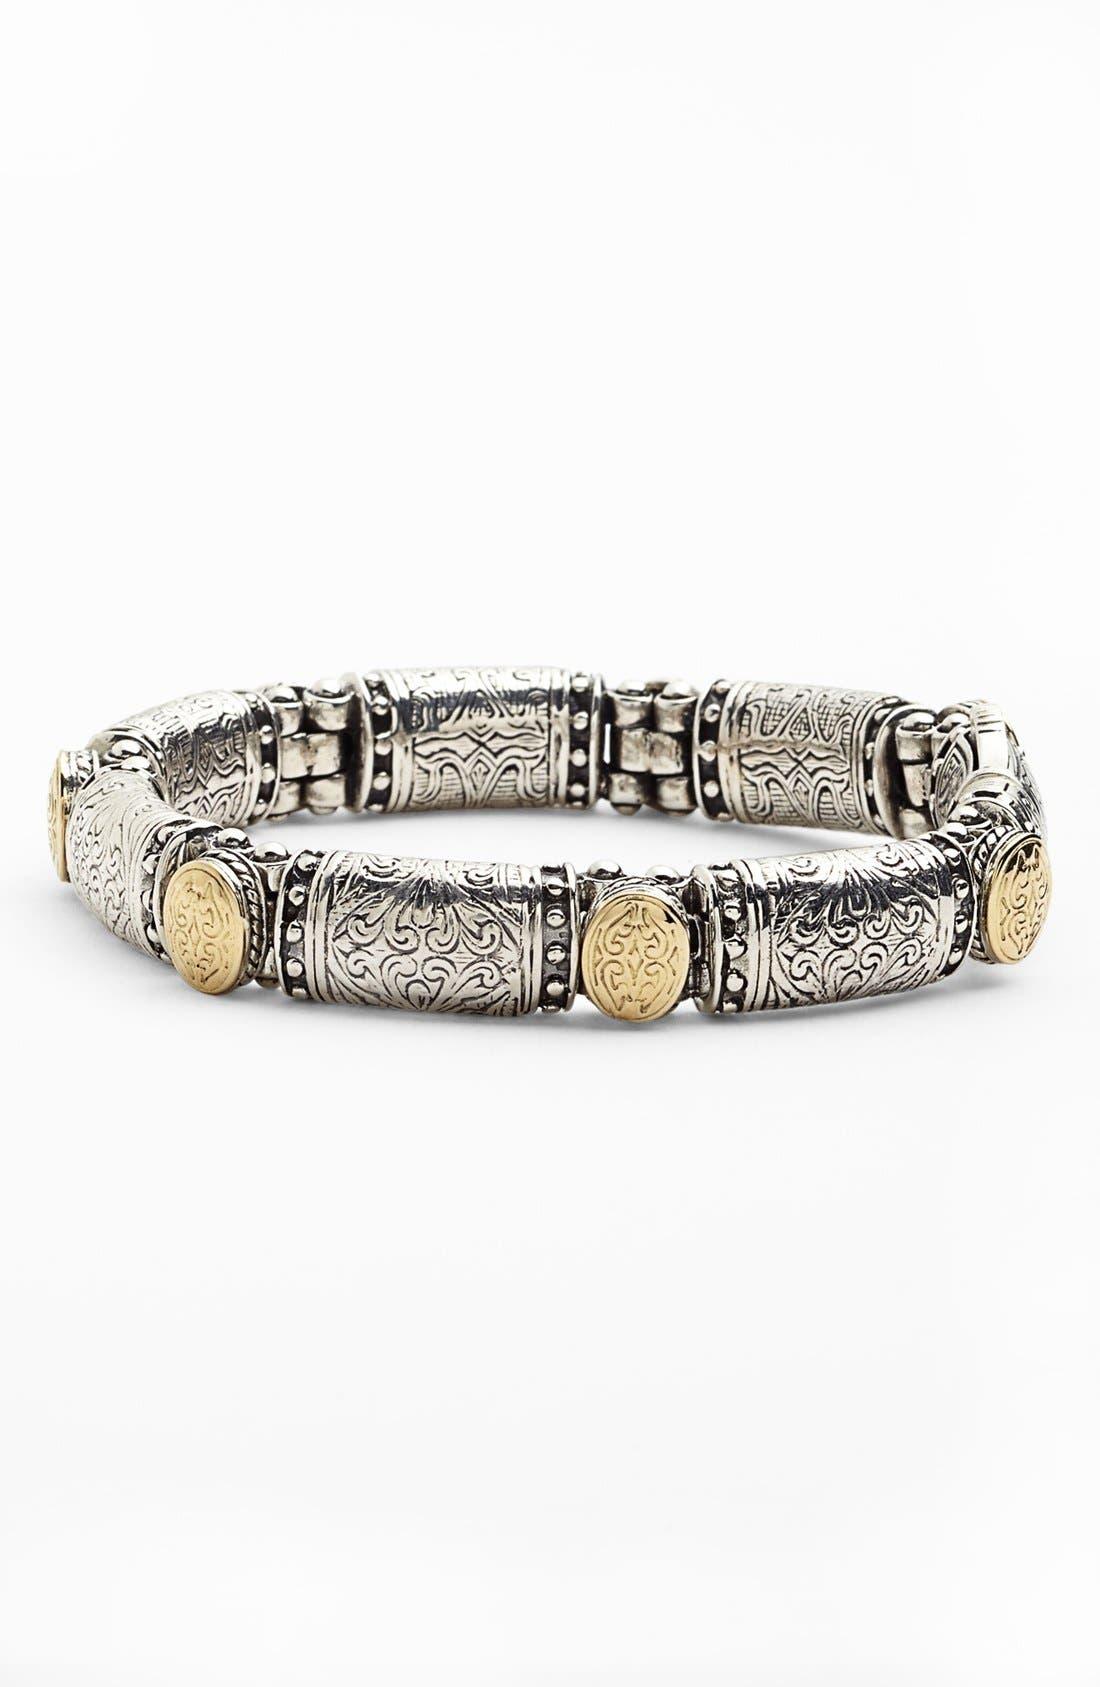 Konstantino 'Classics' Two-Tone Bracelet